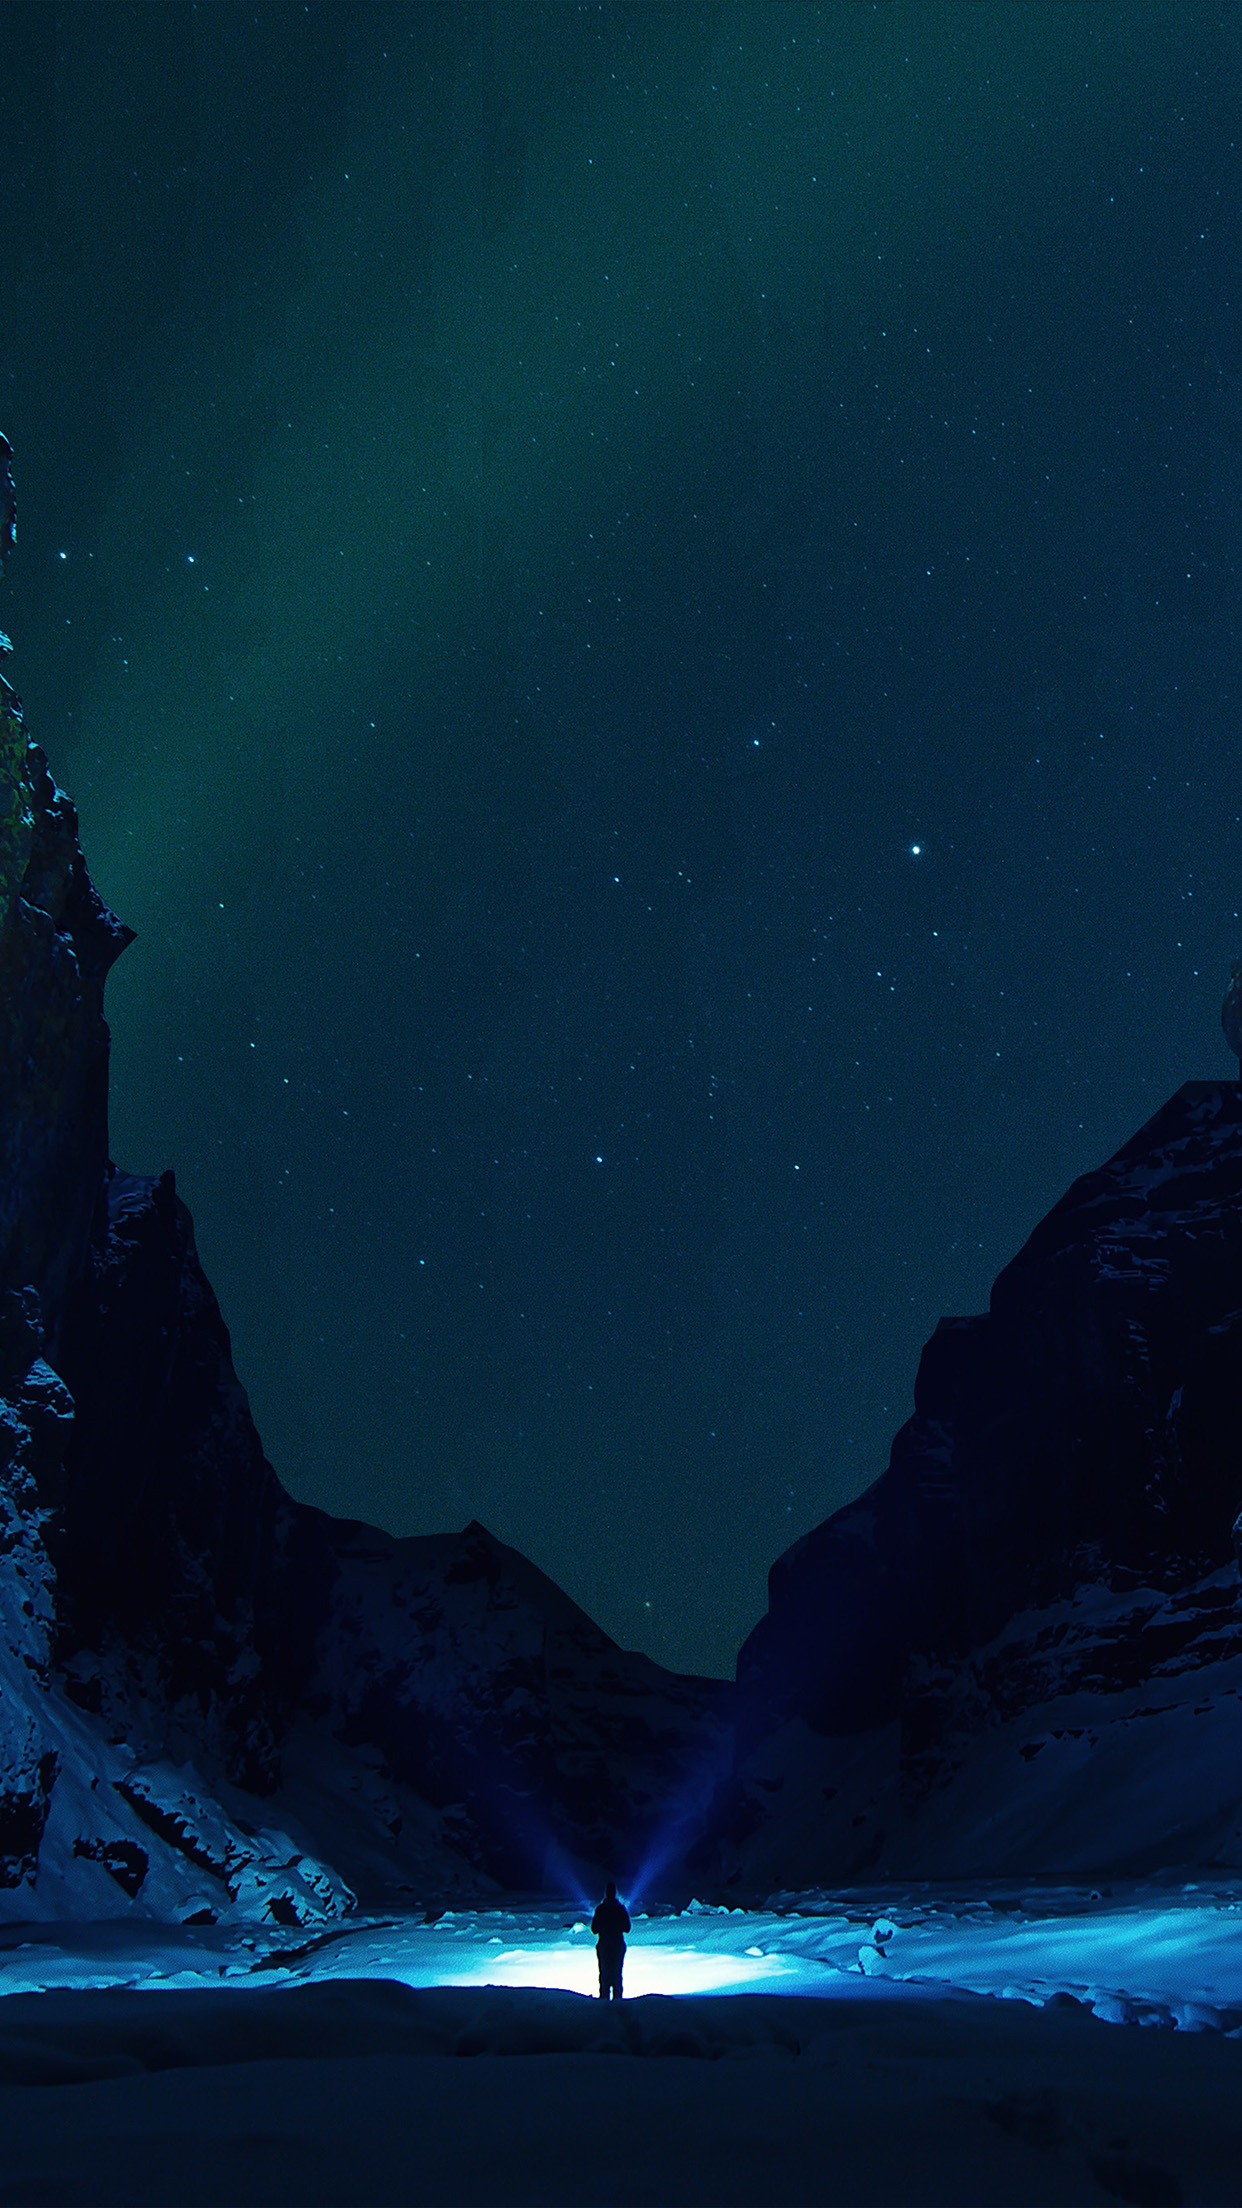 Moto G Plus >> nv33-winter-dark-night-mountain-nature-wallpaper